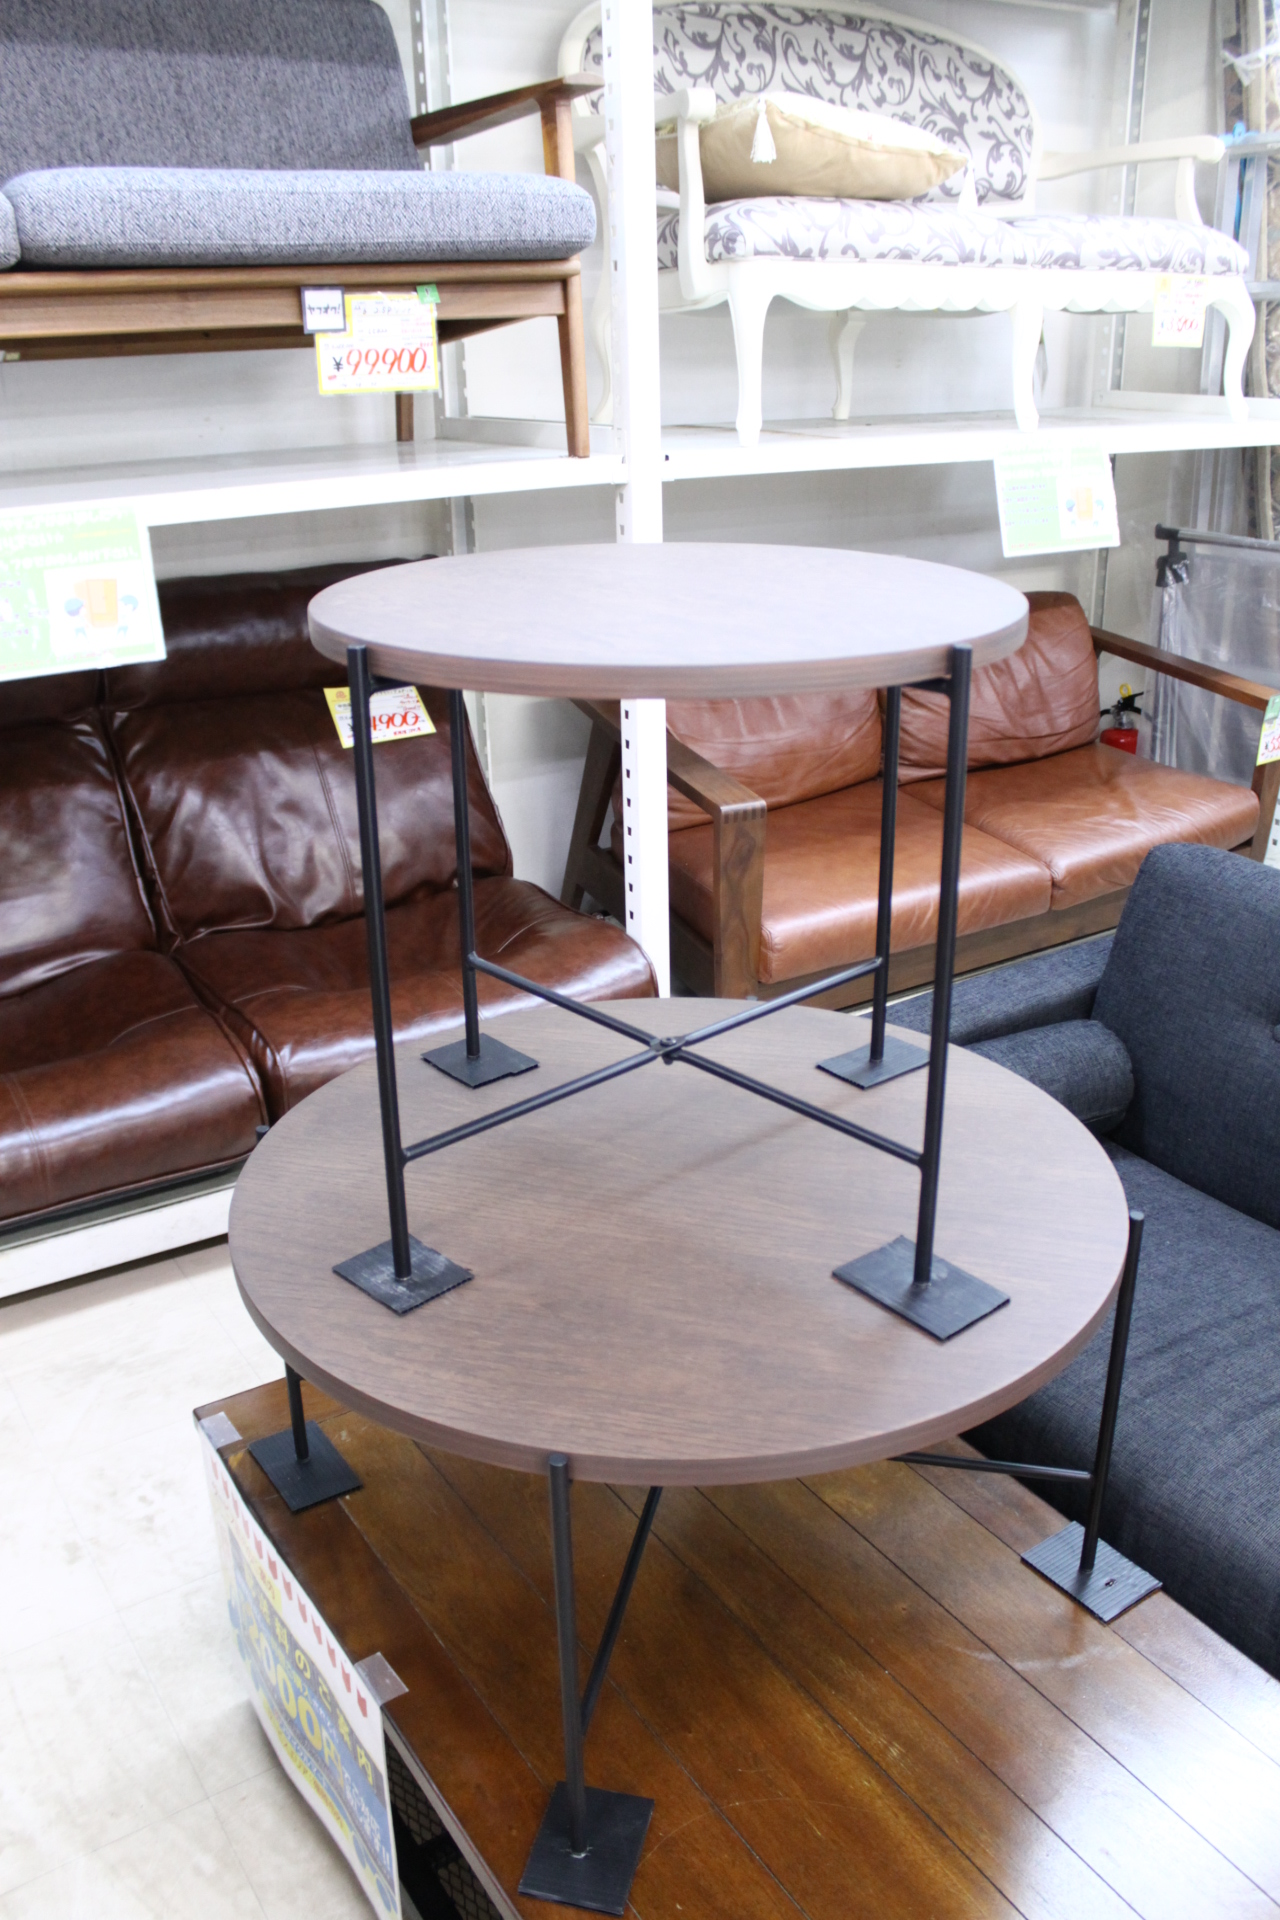 【NITORI ニトリ 円形テーブル  カフェ テーブル セット ヴェルカー 7050LBR】を買取させて頂きました!の買取-